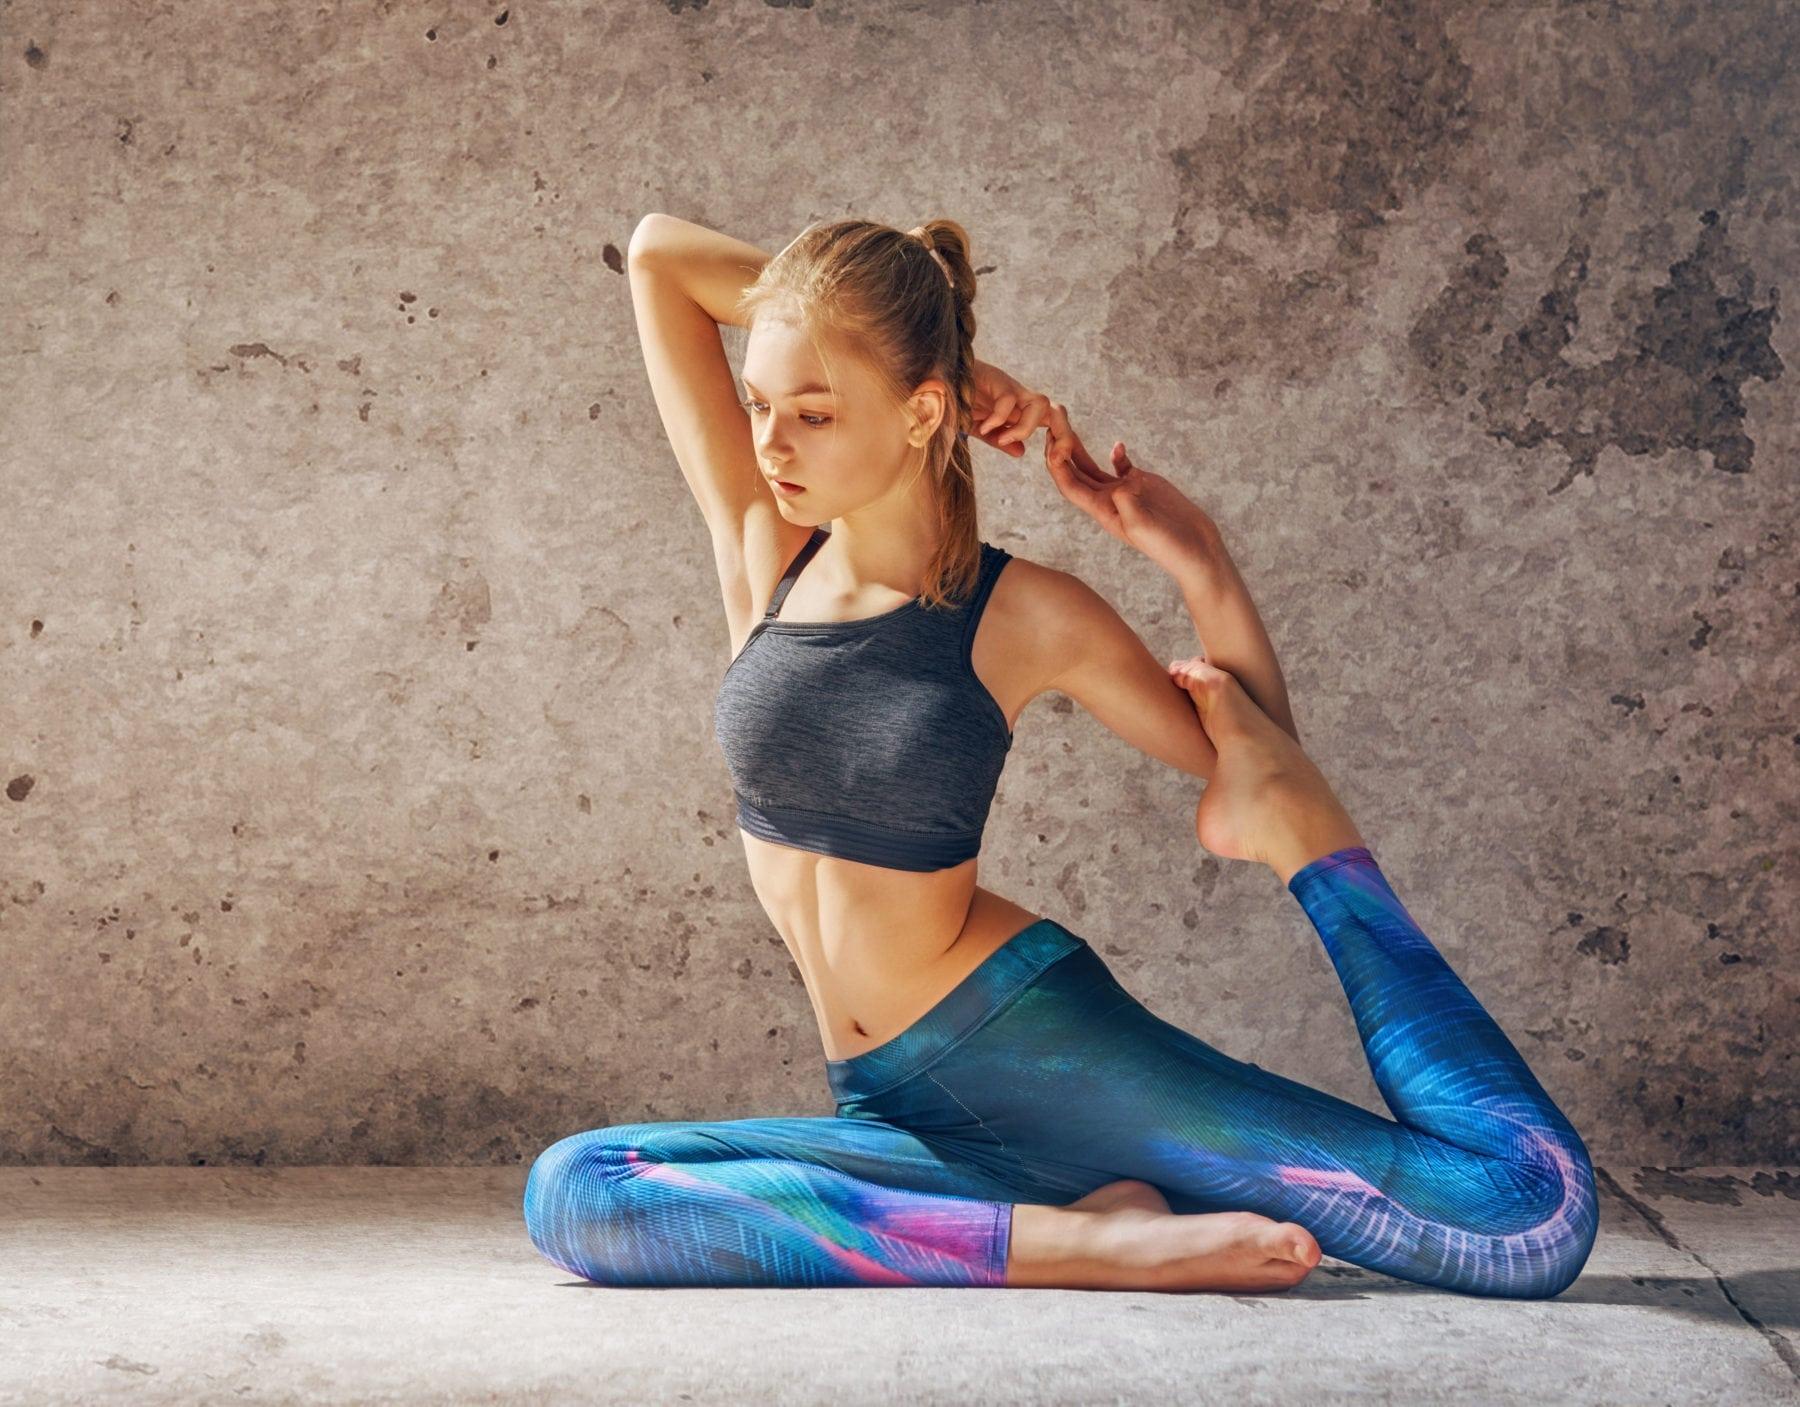 legging, sports performance